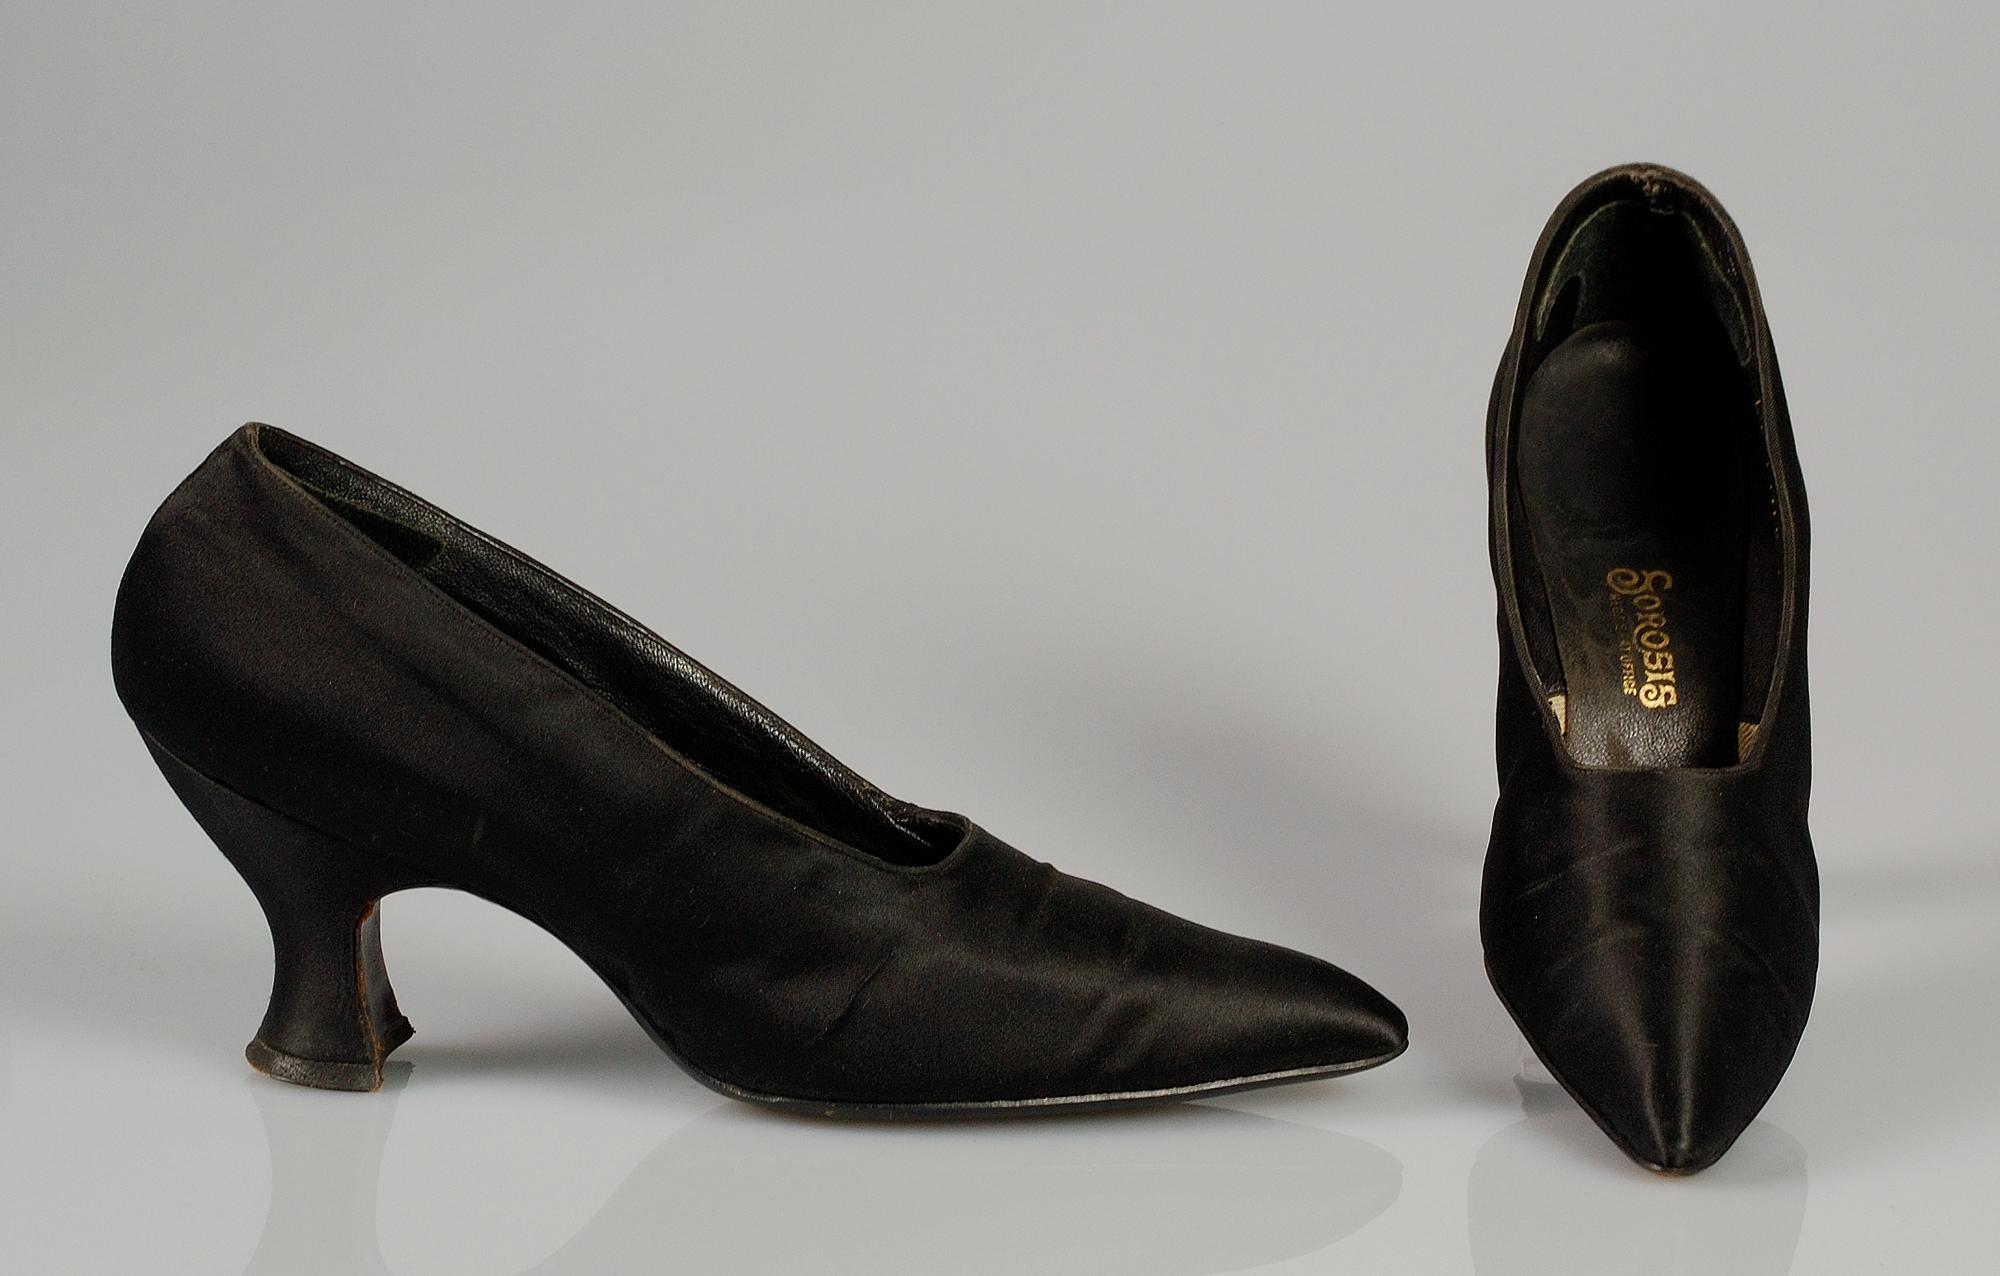 کفش پاشنه بلند مدل اسپول